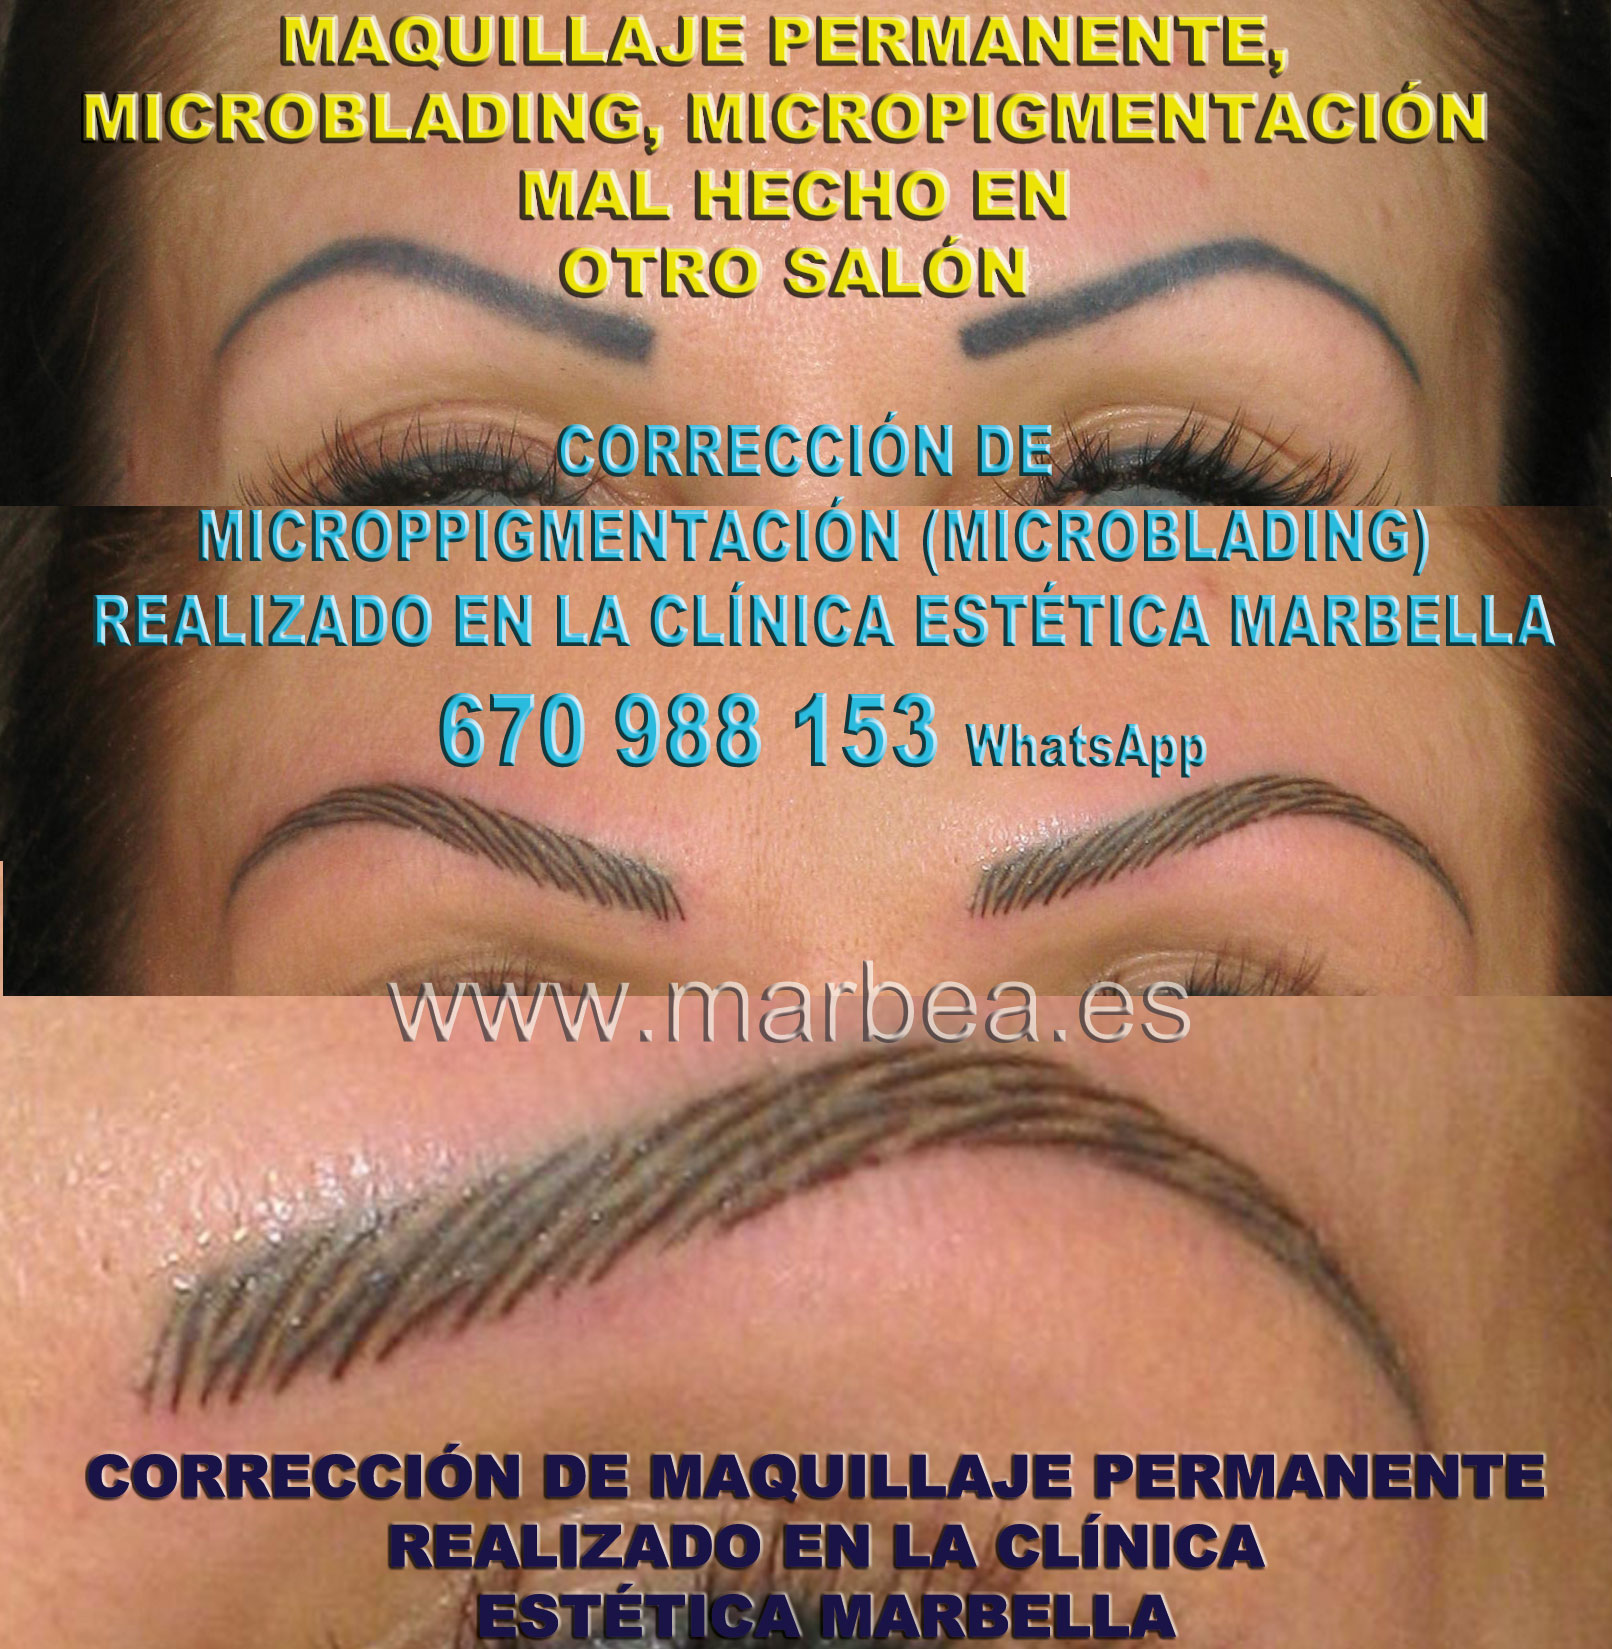 Borrar maquillaje permanente mal hecha clínica estética maquillaje semipermanente ofrenda micropigmentacion correctiva de cejas,micropigmentación correctiva cejas mal hecha